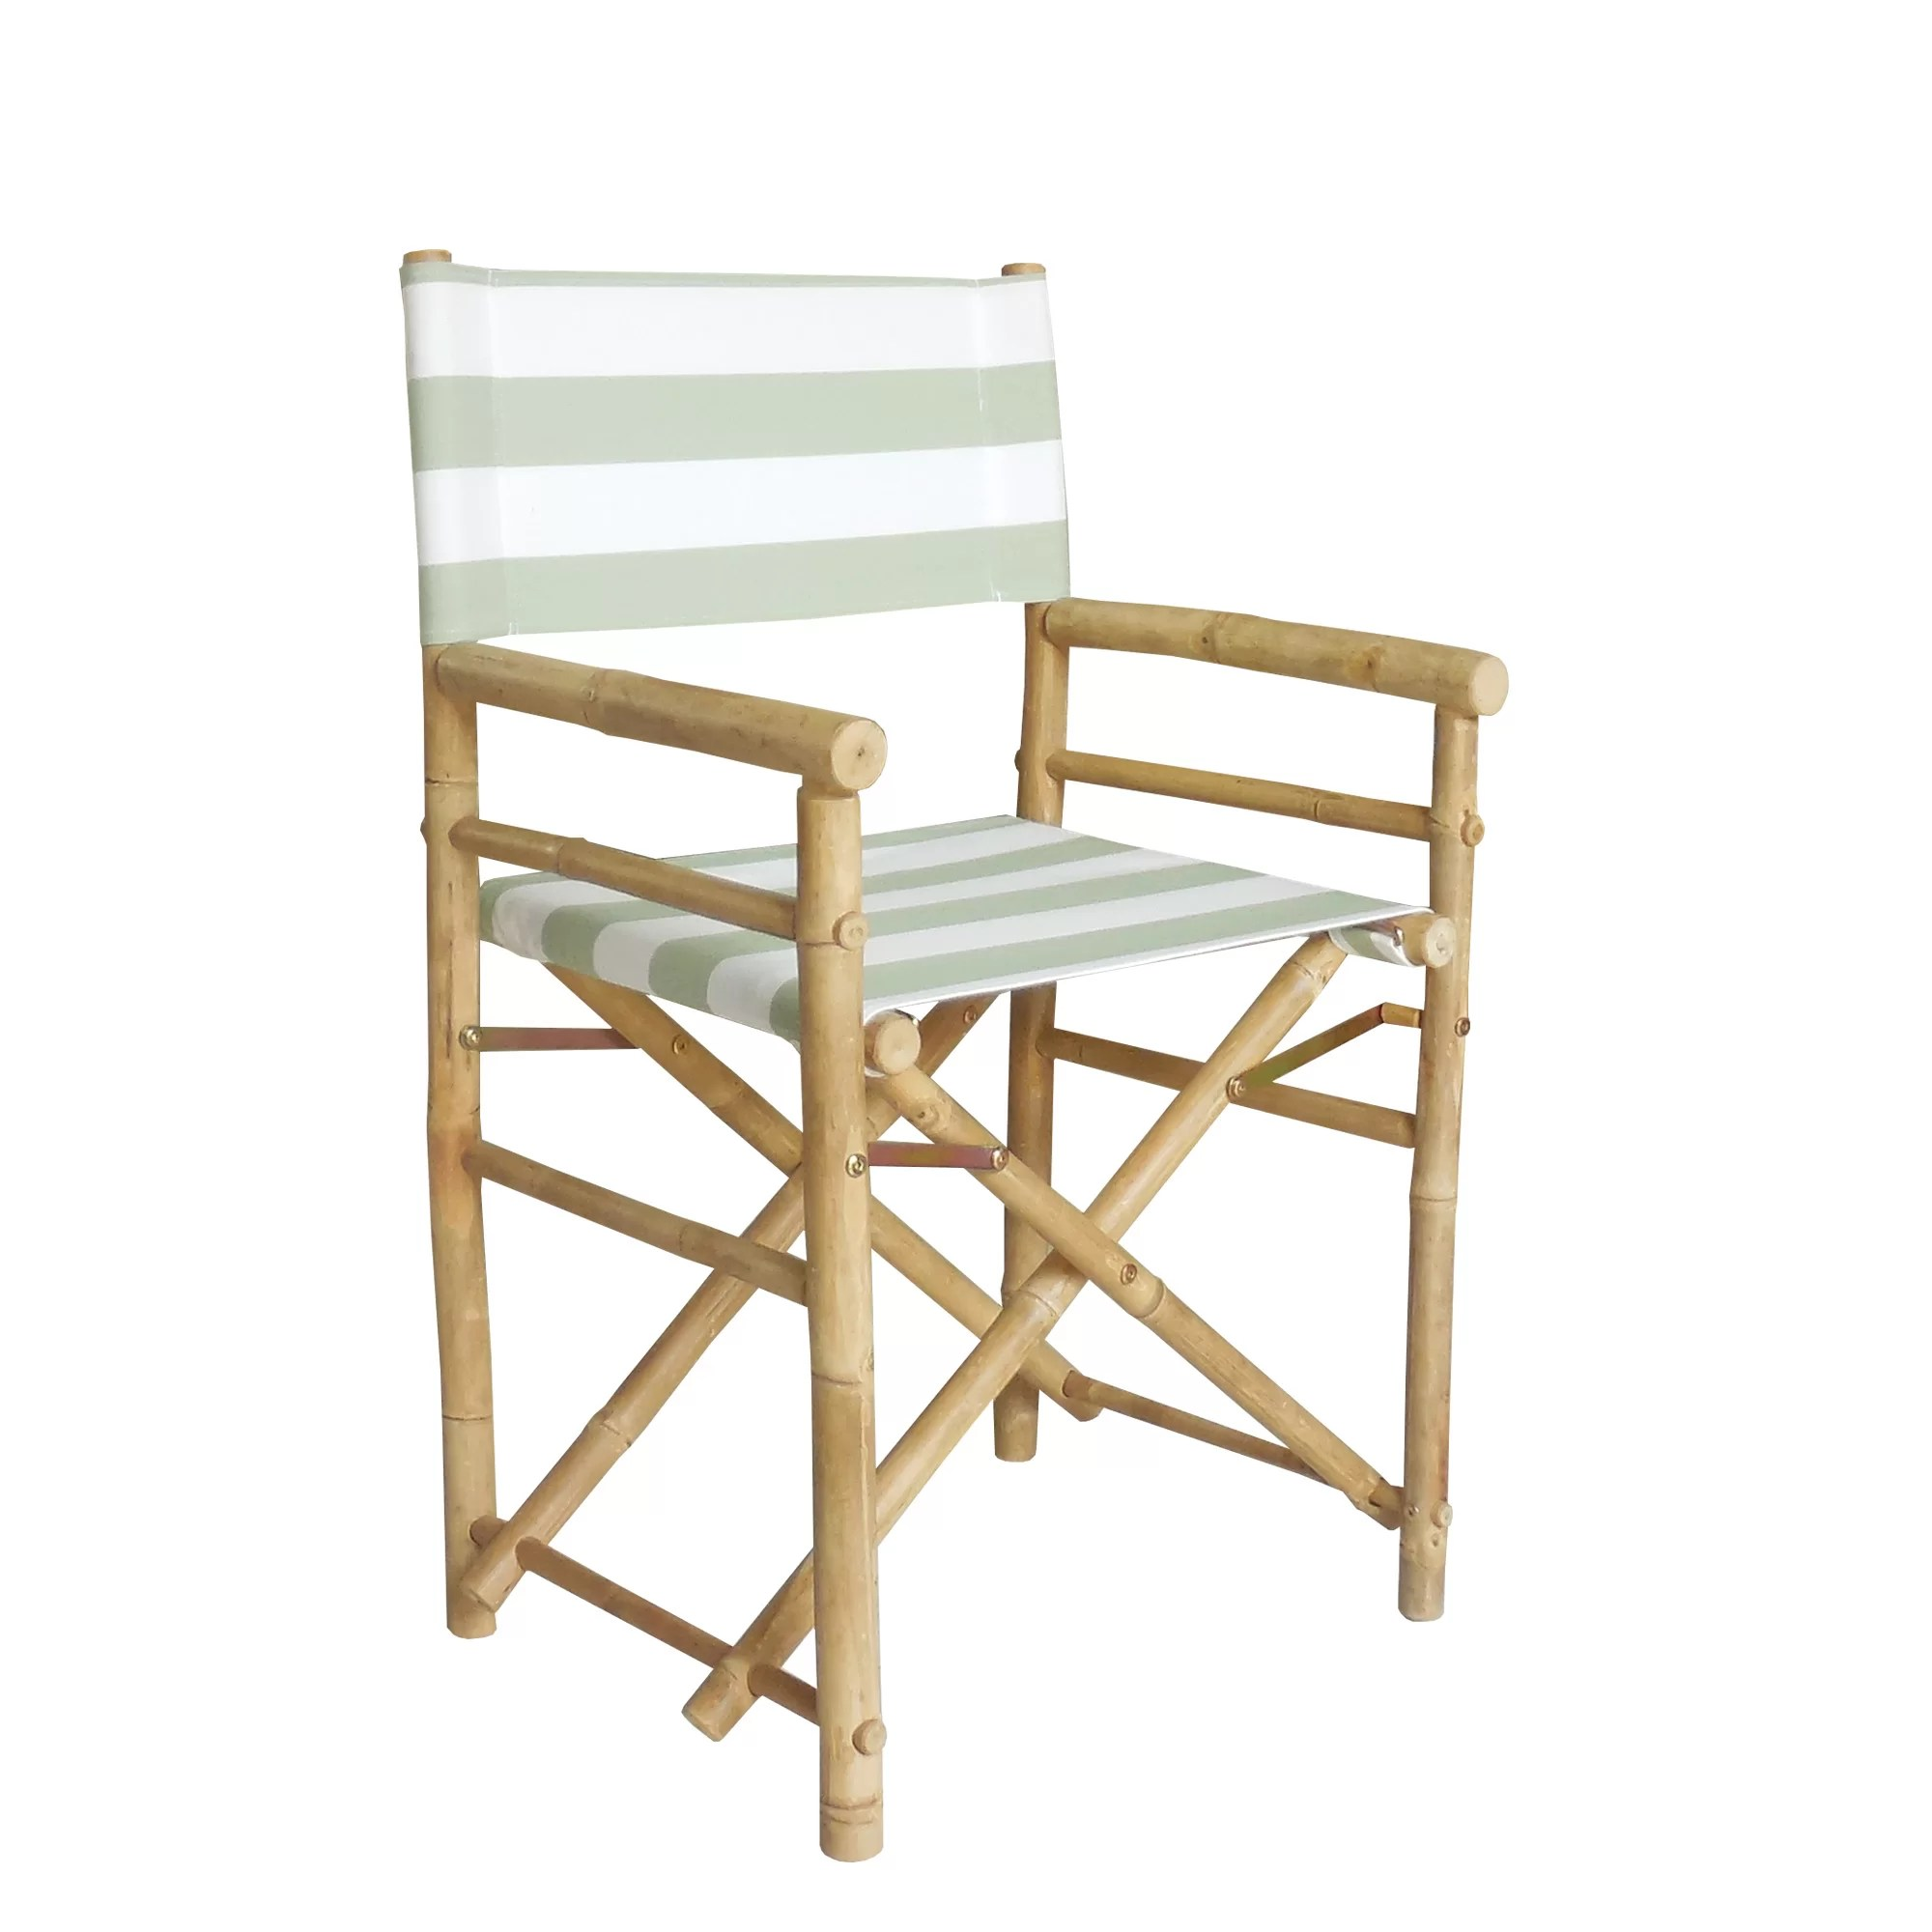 bamboo directors chairs desk and chair set argos zew hand crafted outdoor indoor director